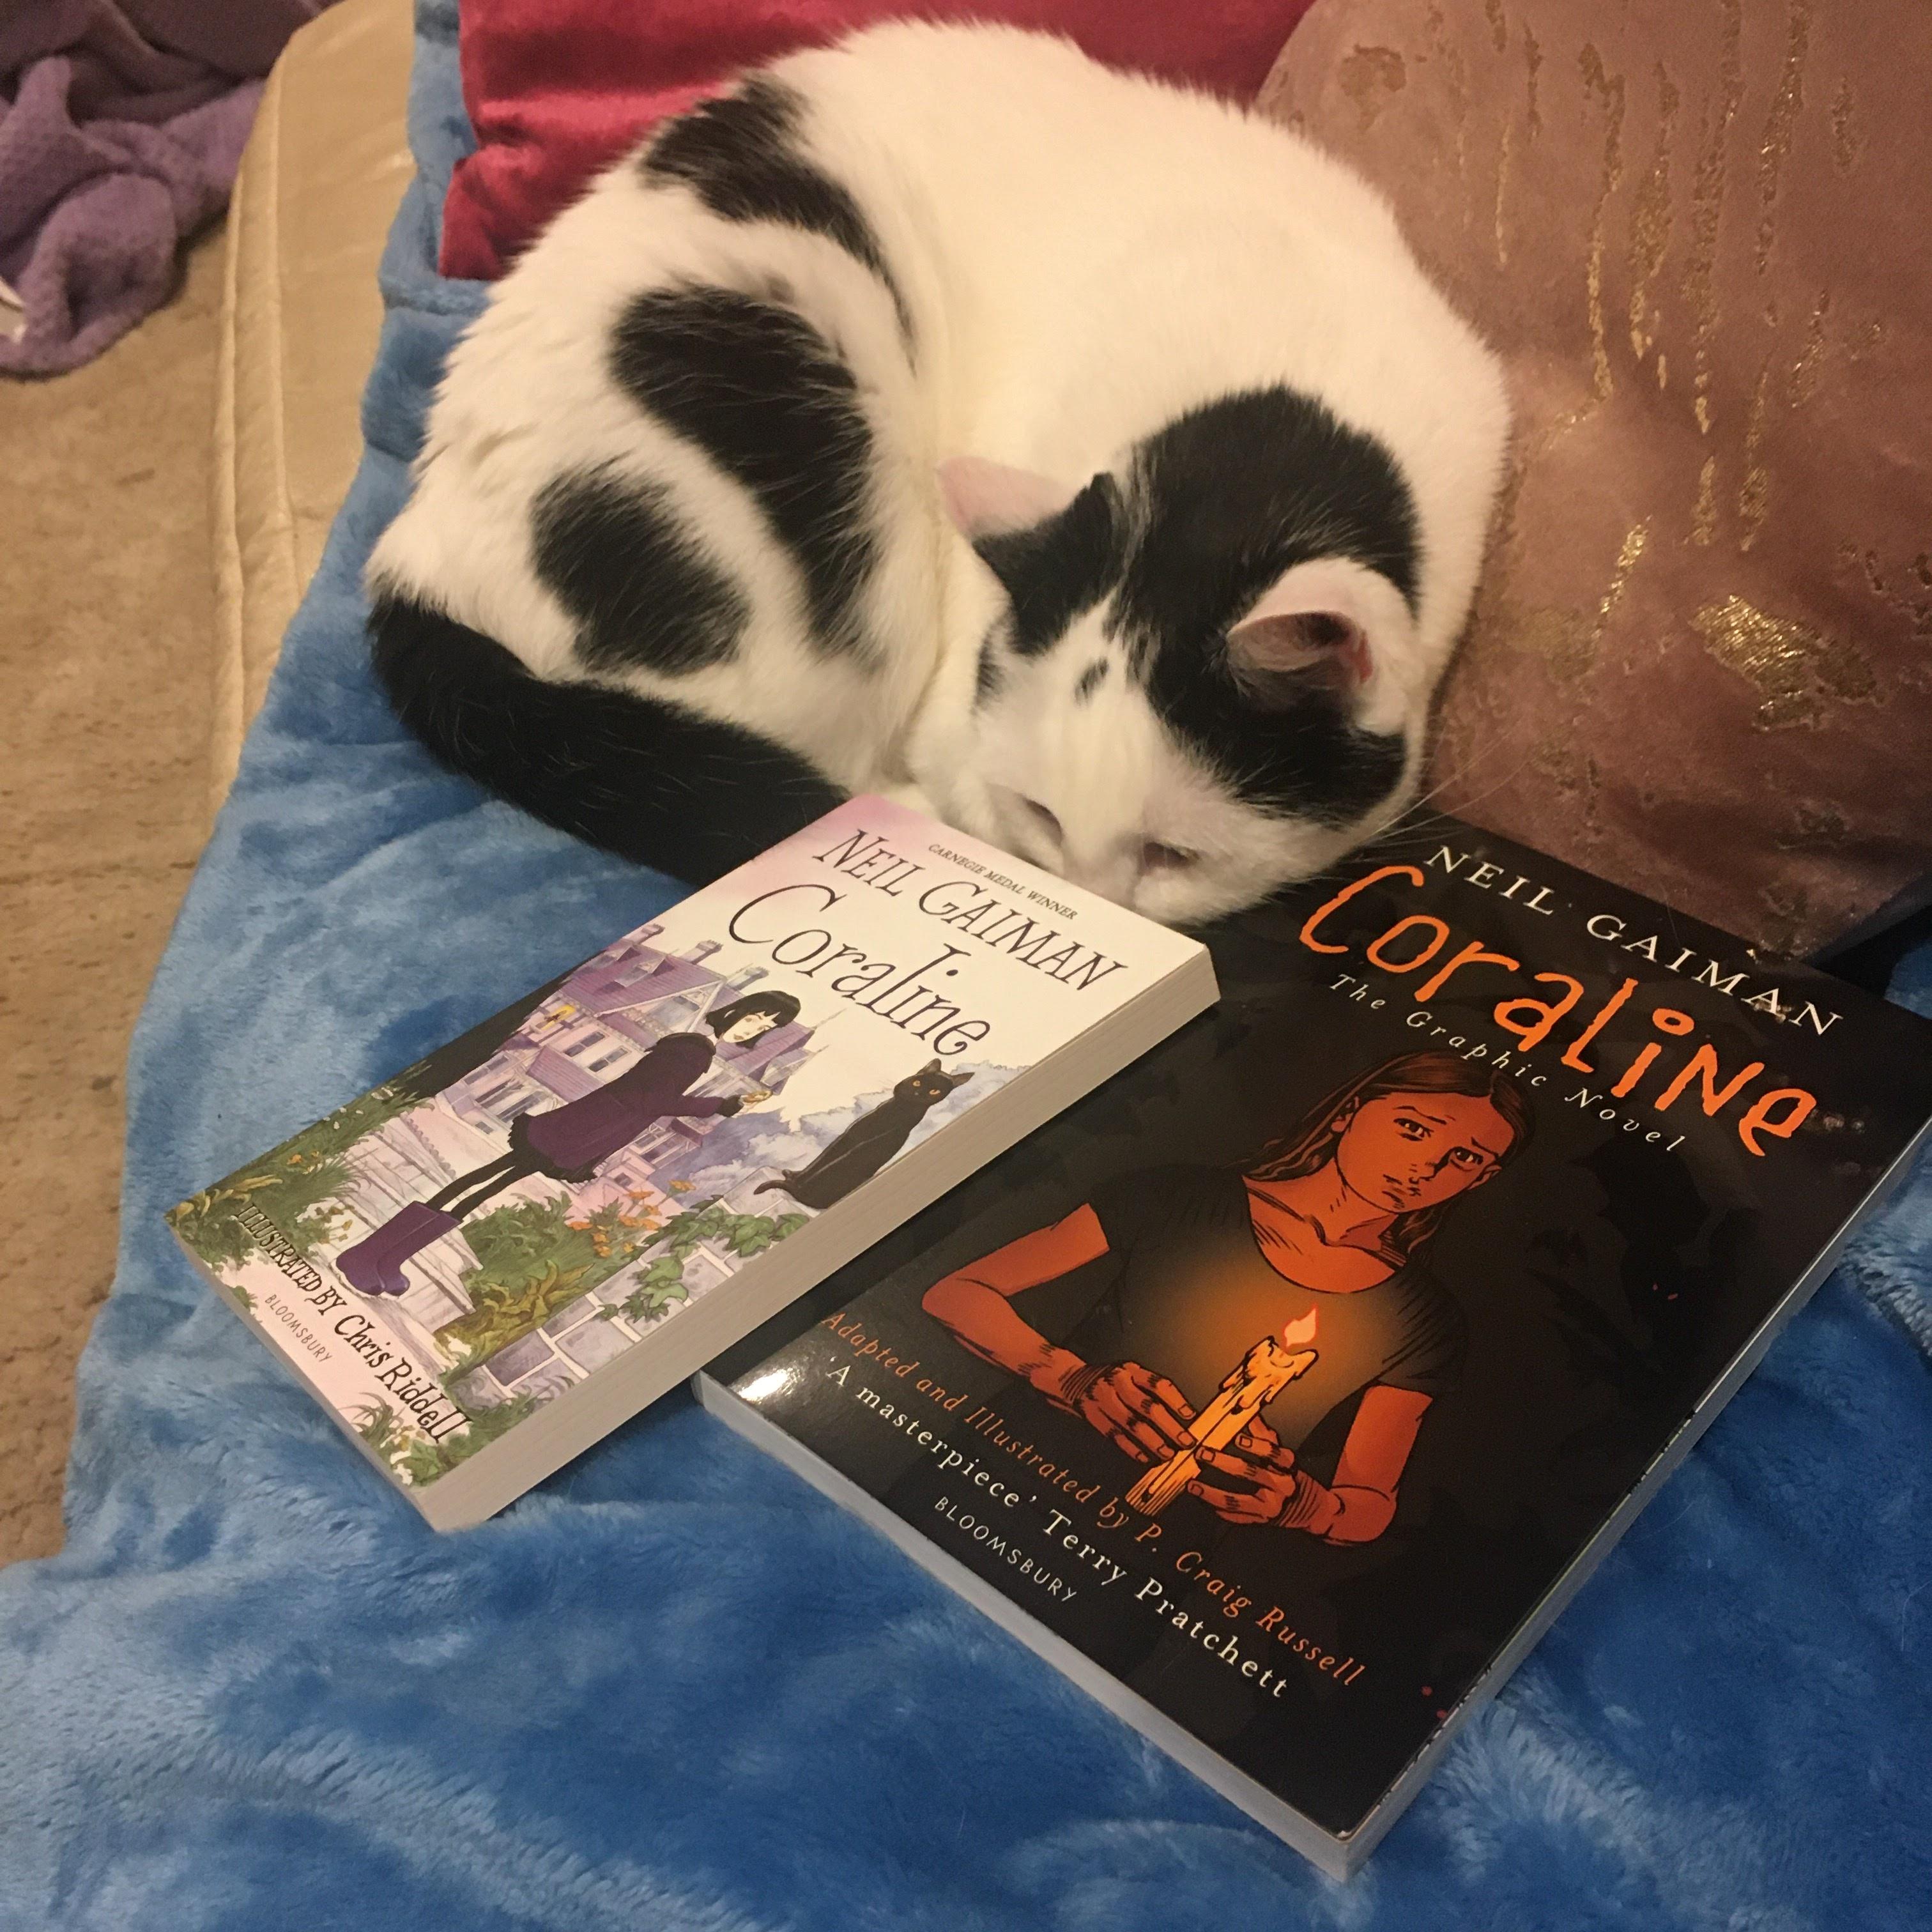 Kathryn S Inbox Review Coraline By Neil Gaiman